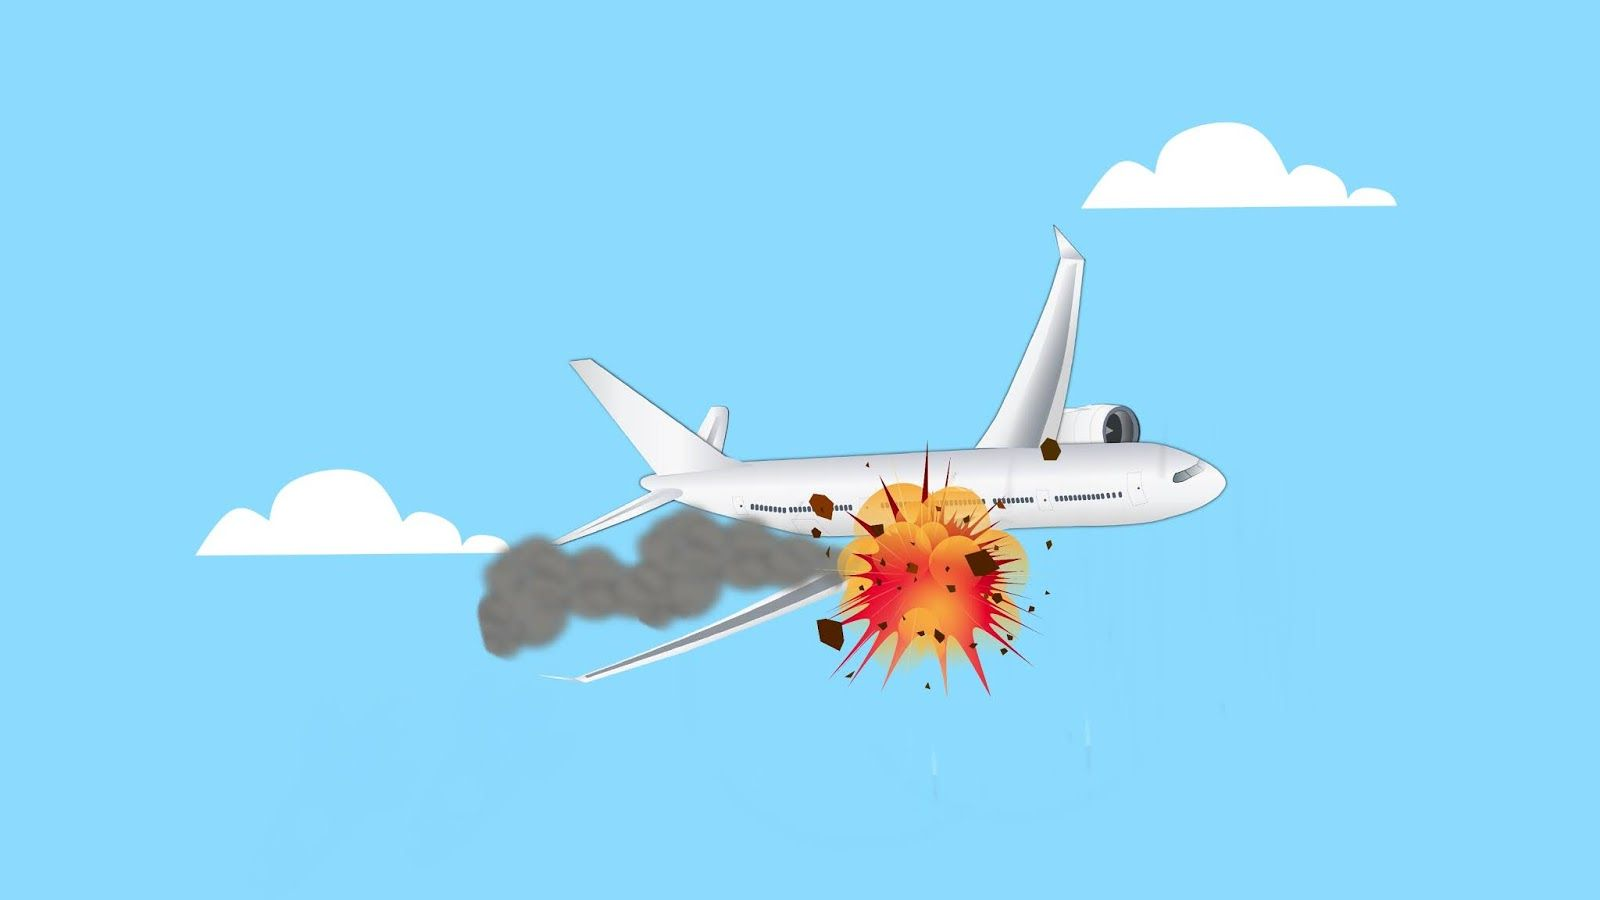 Download Free Images And Illustrations Illustration Of Airplane Crash Accident Illustration Crash Free Images